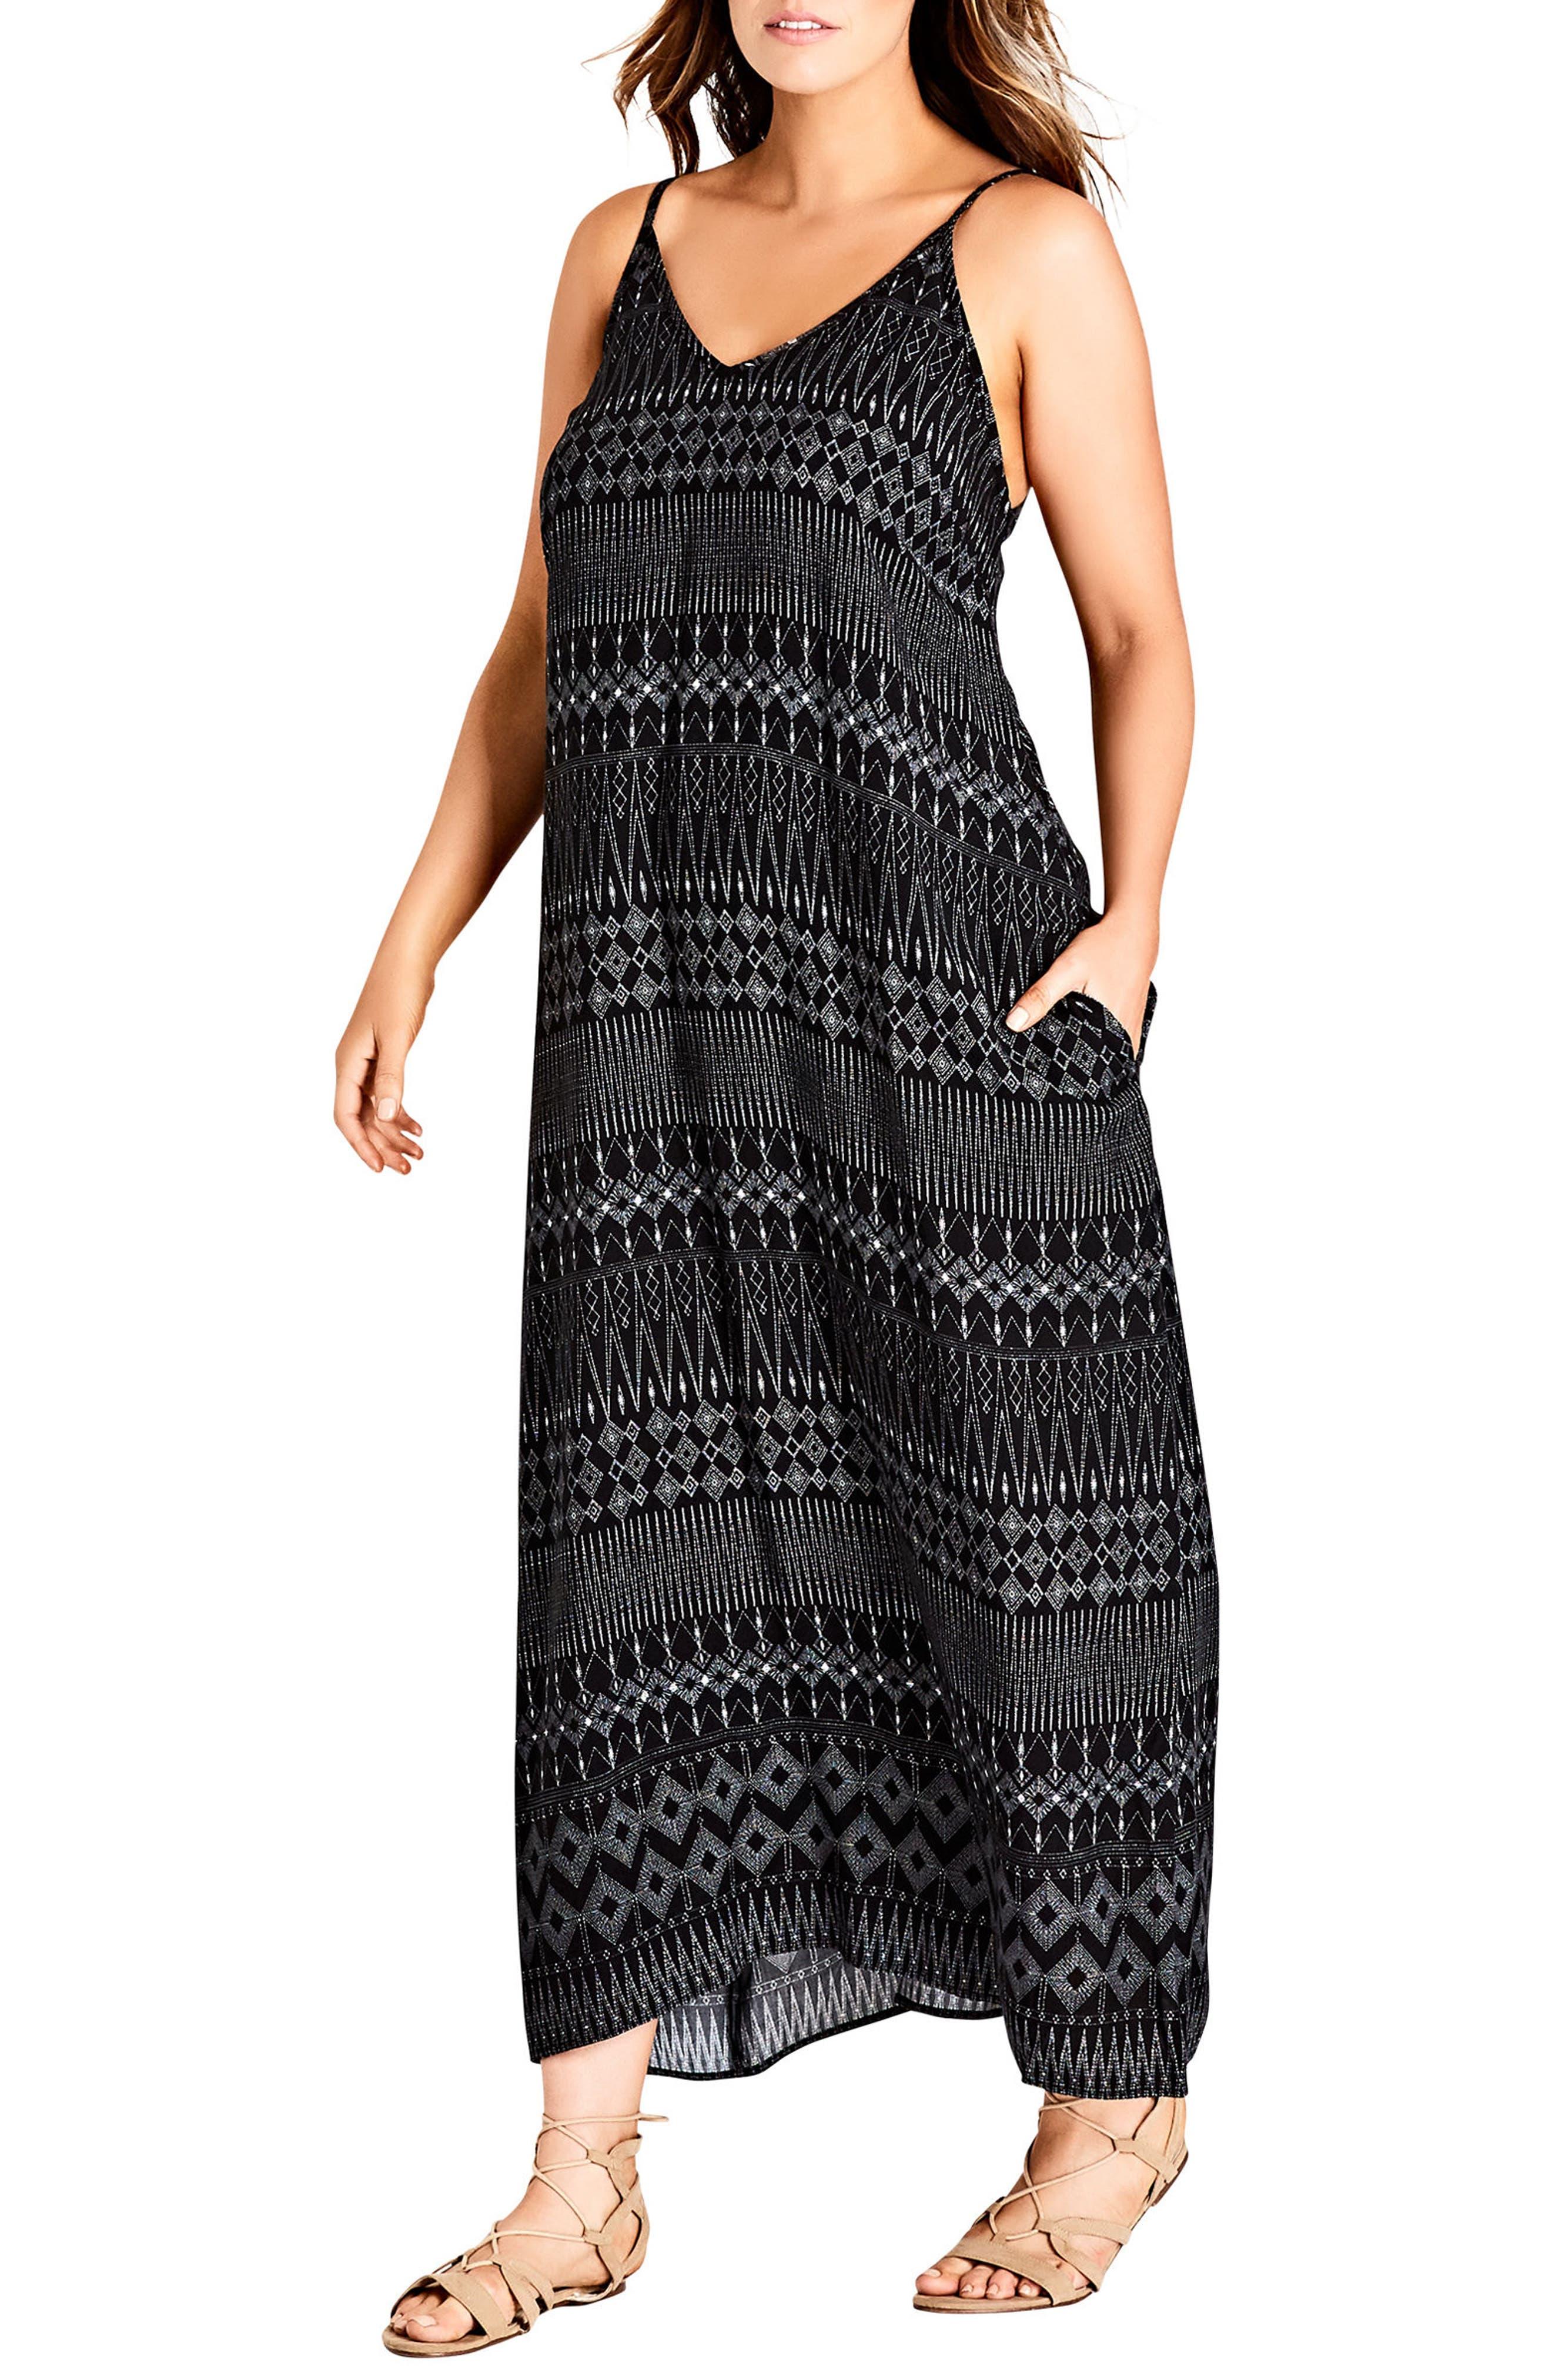 Safari Maxi Dress,                             Main thumbnail 1, color,                             Black Print